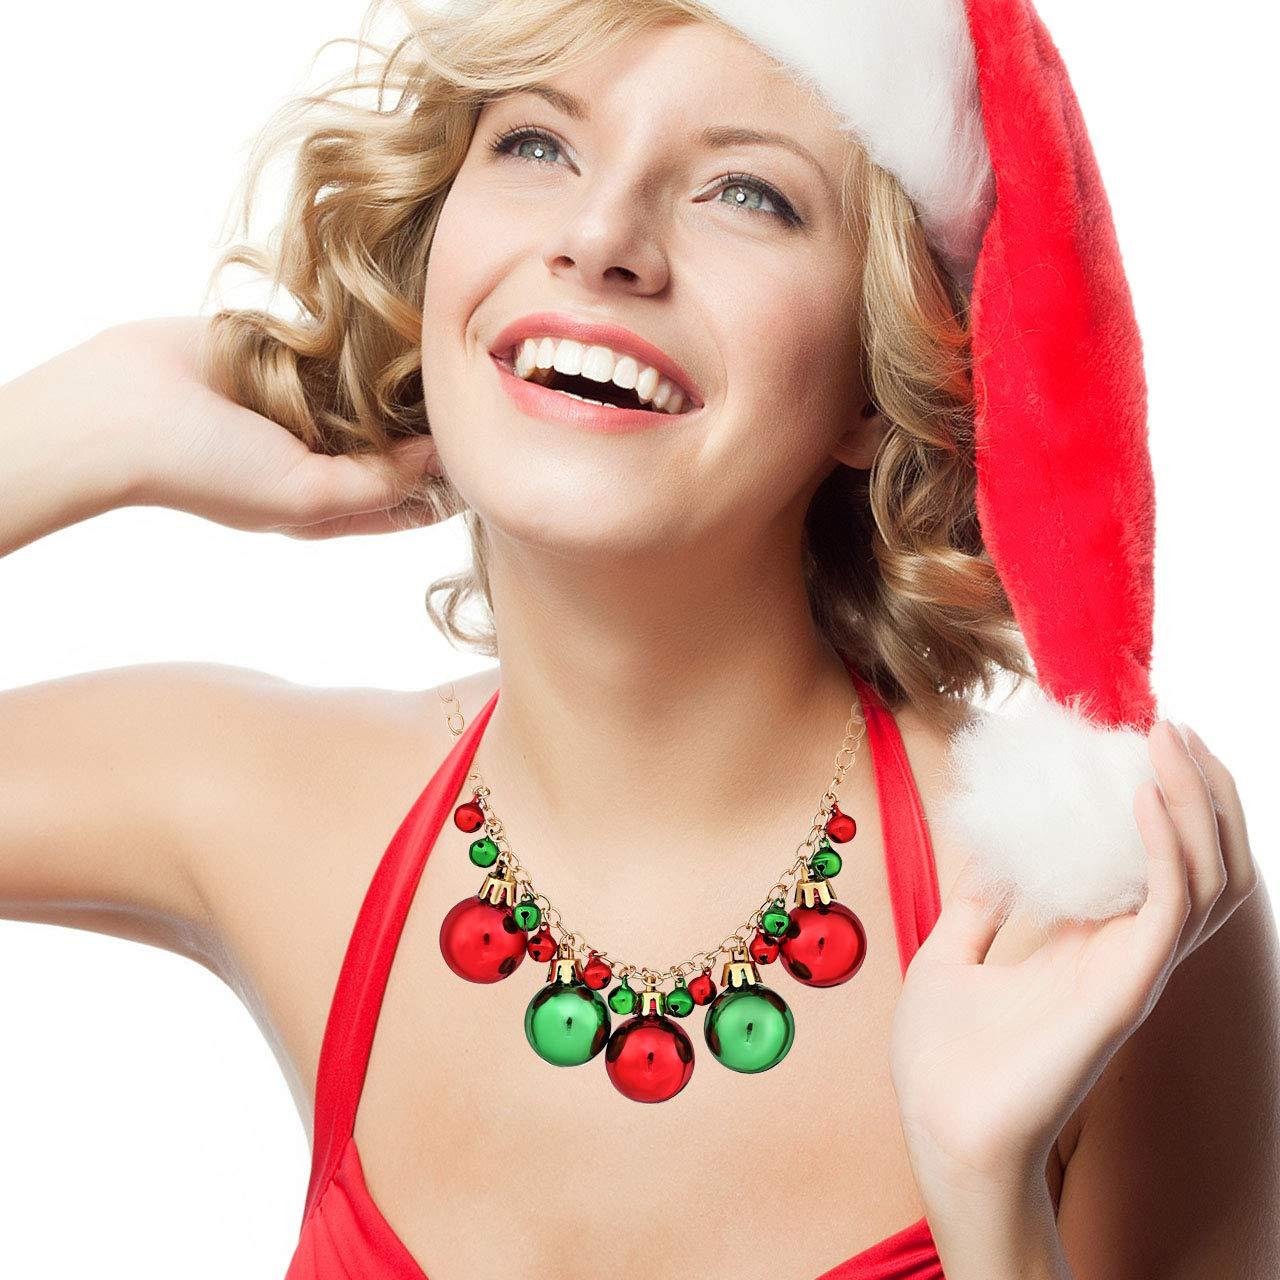 XOCARTIGE Christmas Necklace X-Mas Jingle Bell Necklaces Bow Pendant Necklace Present for Women Girls